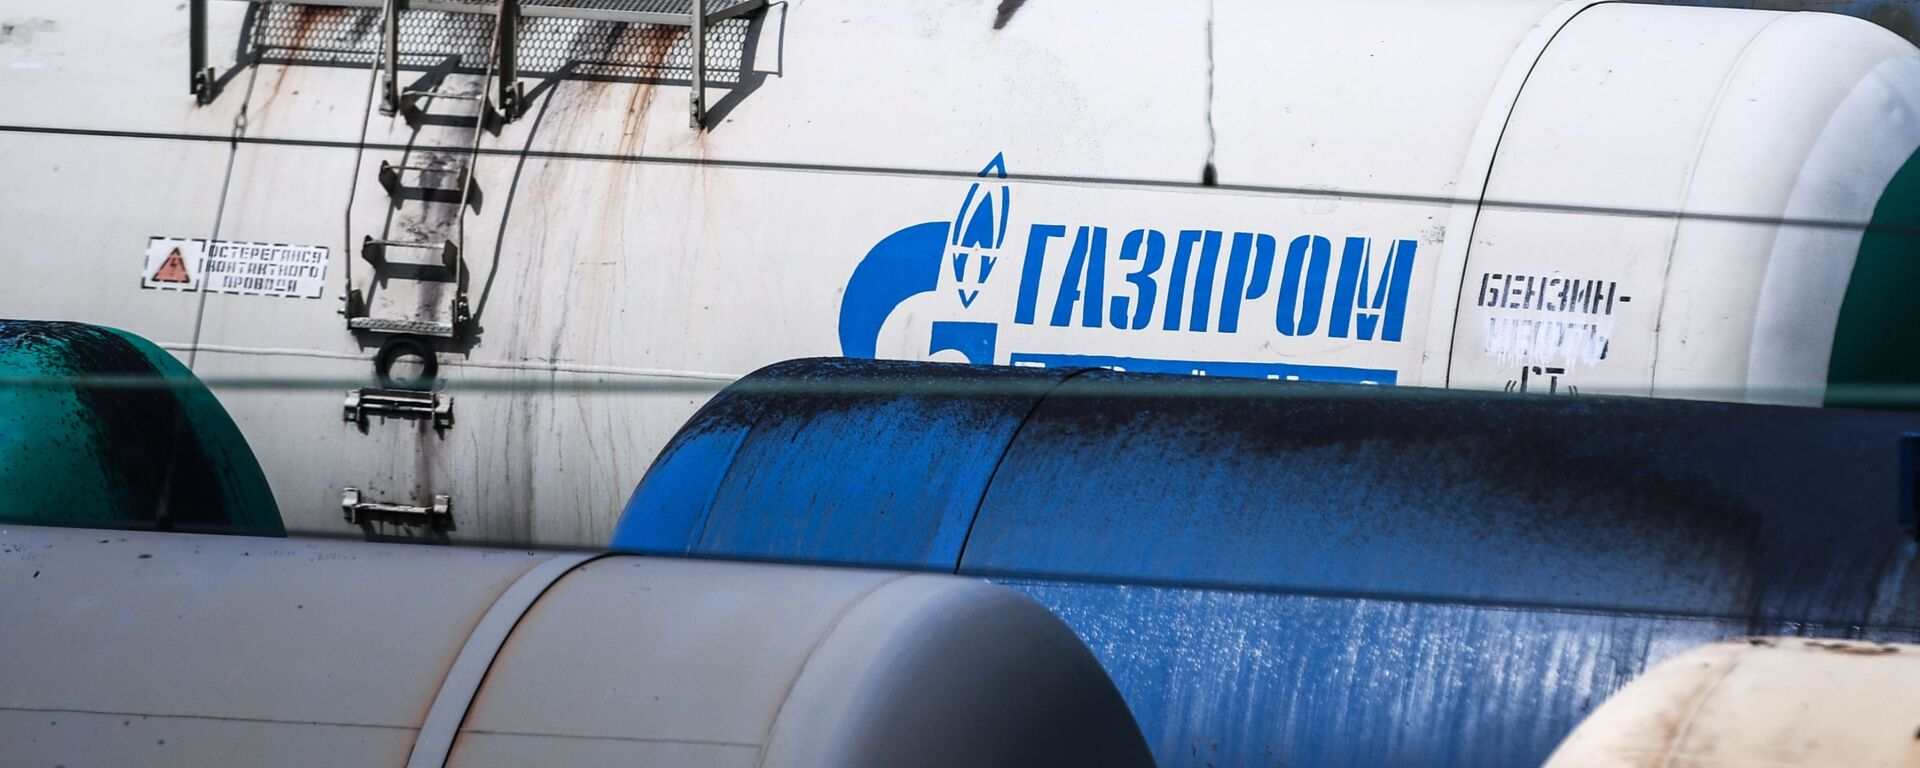 Gazprom - Sputnik Polska, 1920, 17.05.2021